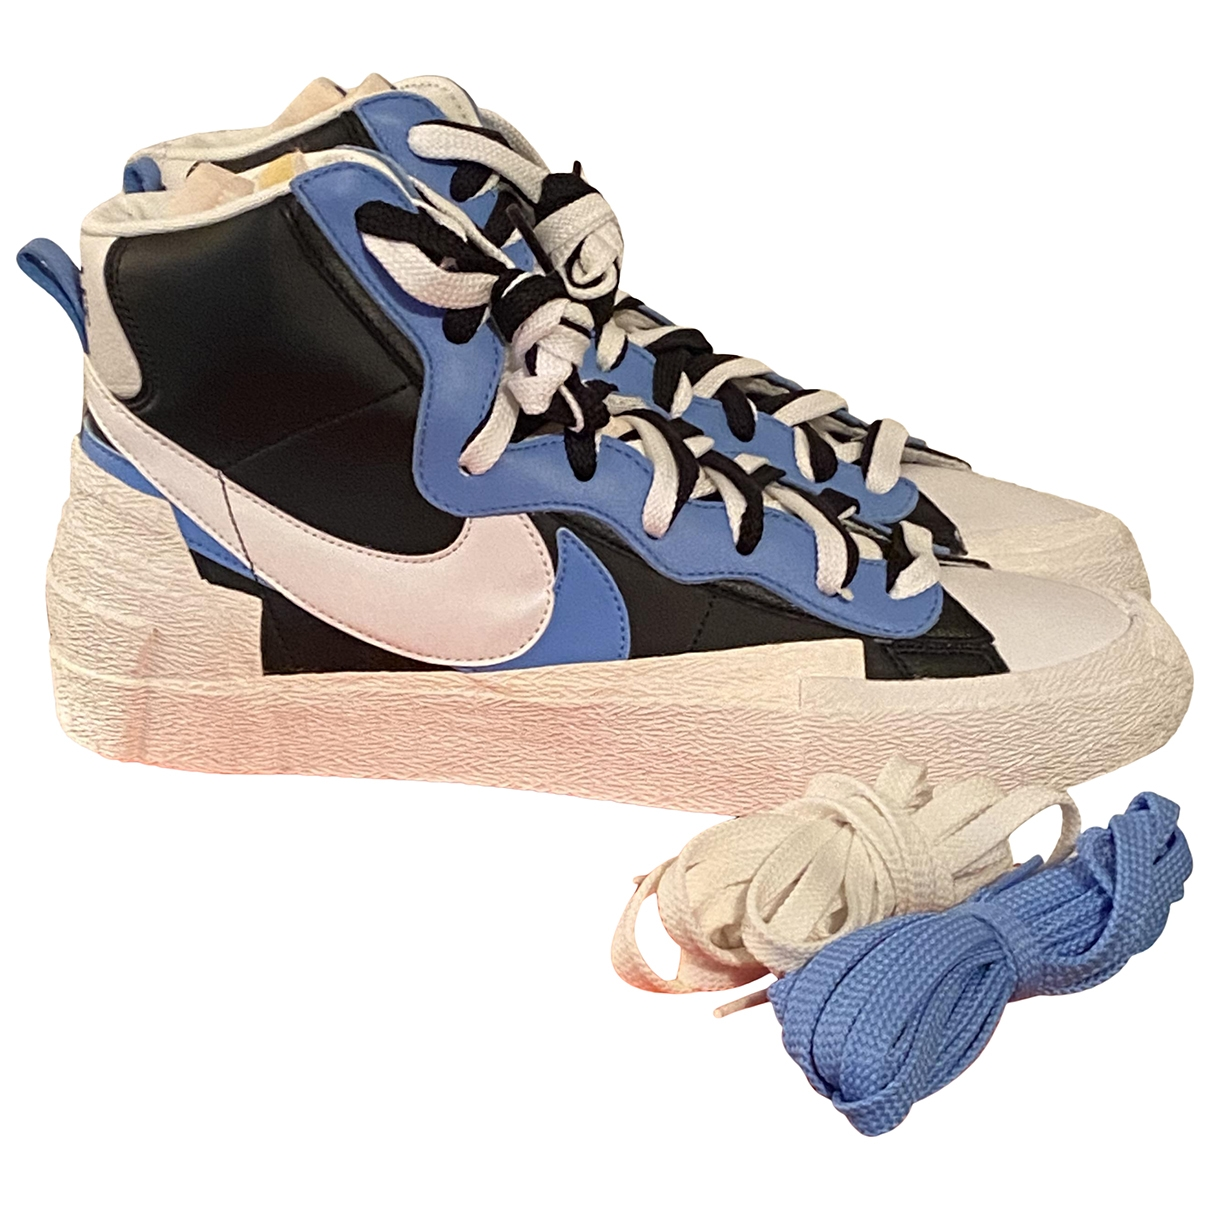 Nike X Sacai - Baskets Blazer Mid pour homme en toile - bleu